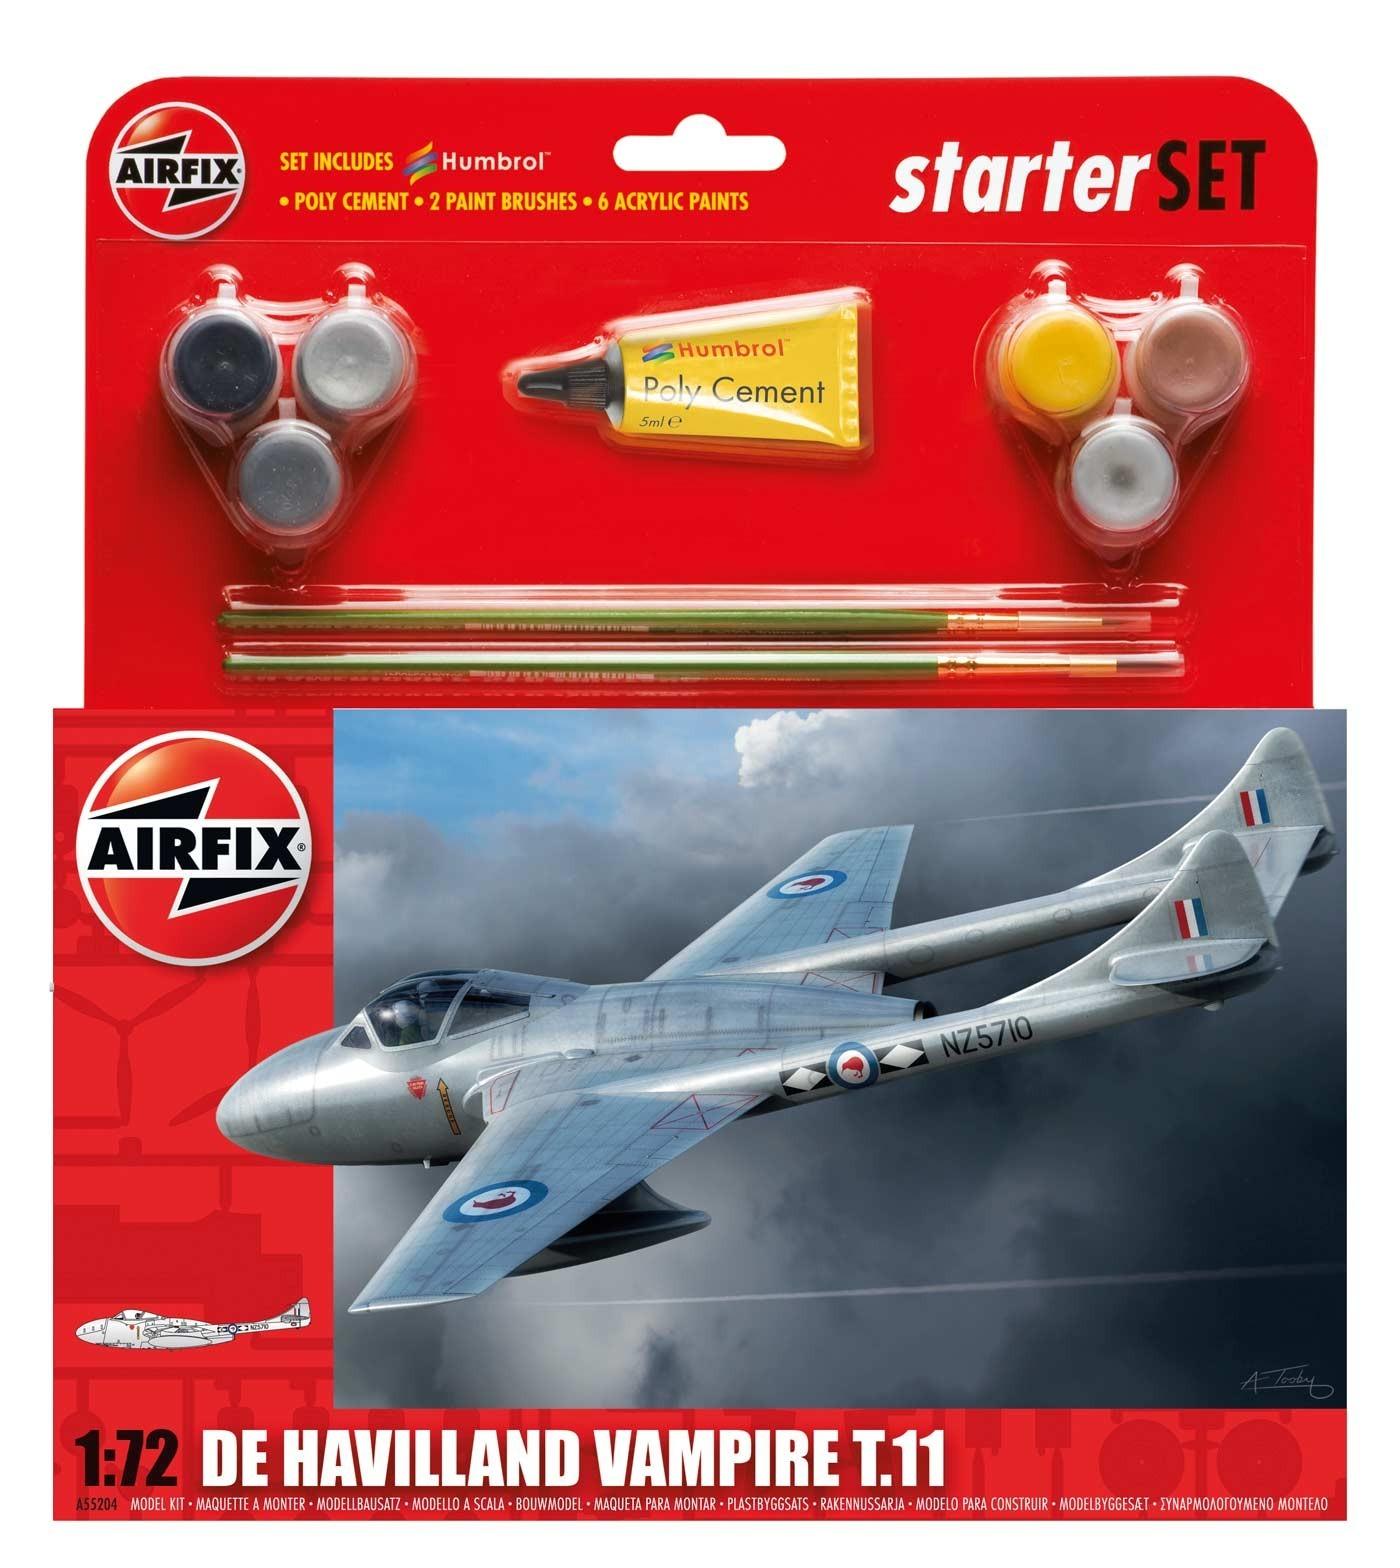 Airfix De Havilland Vampire T11 Starter Set 1/72 Model Kit image